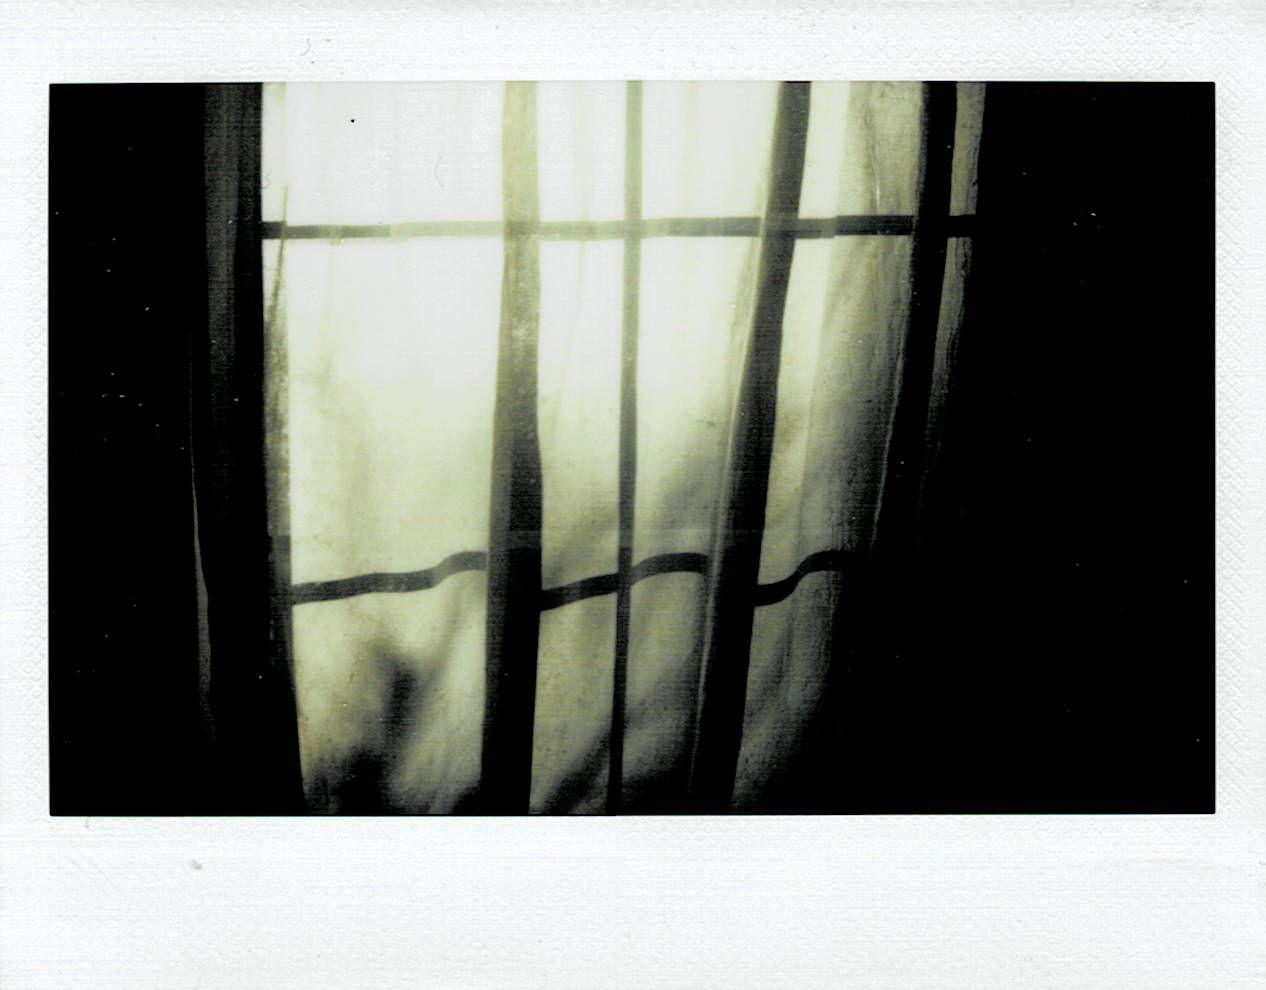 sheer curtain at morning light